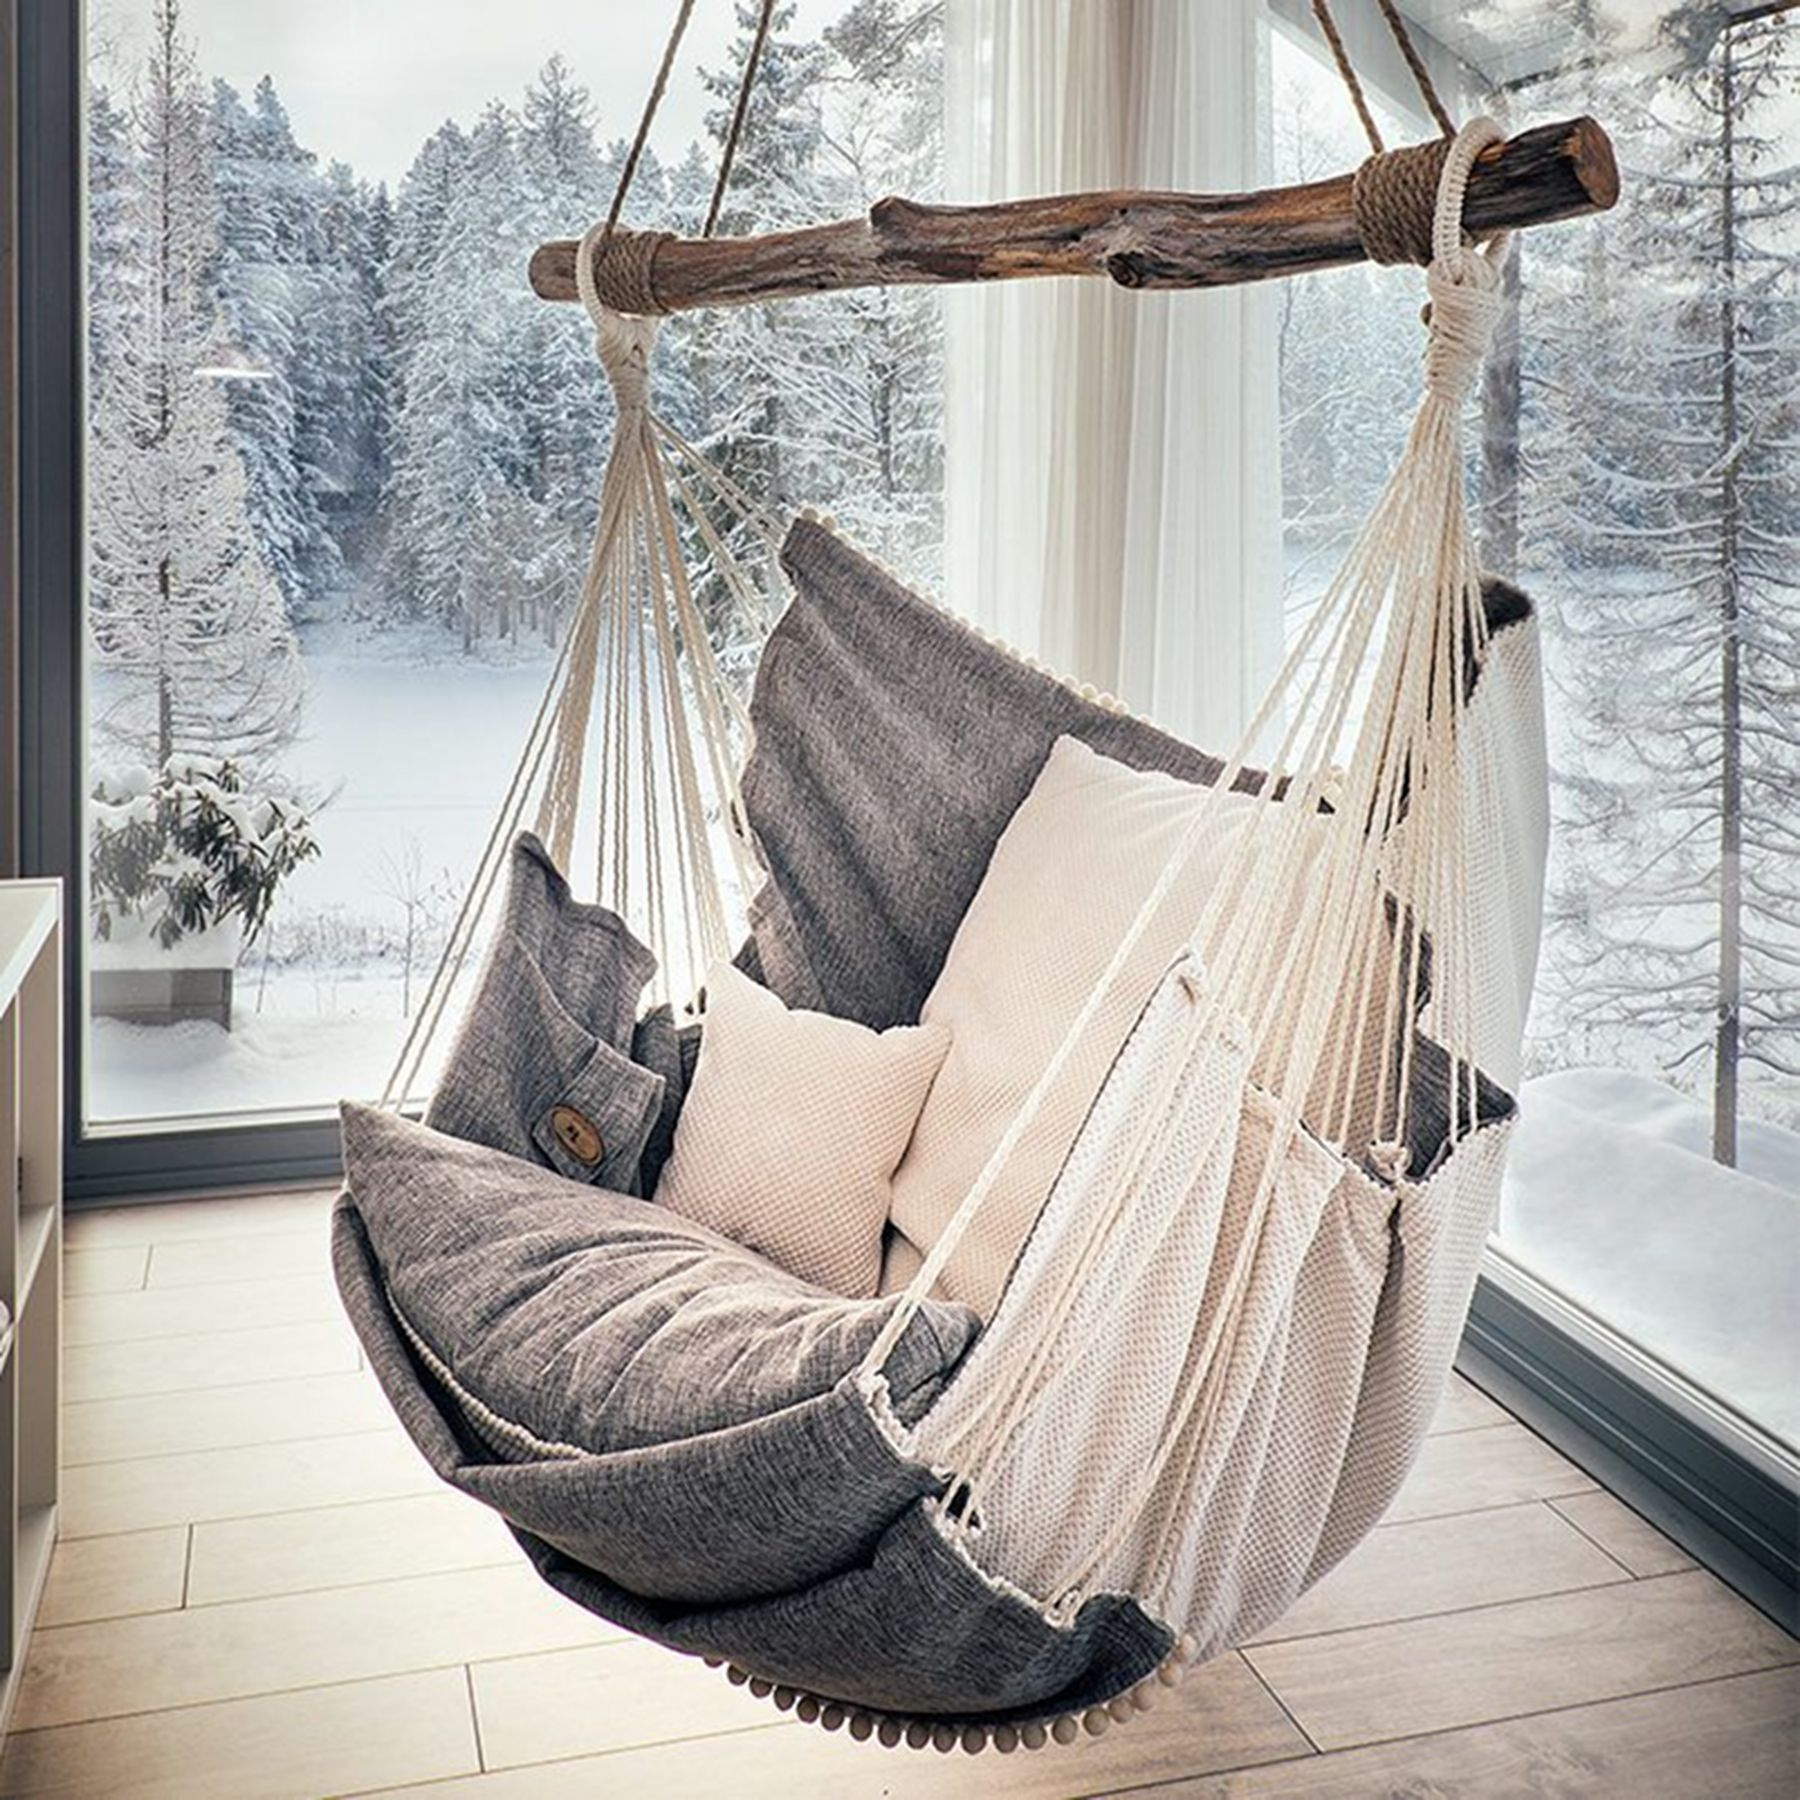 DIY Hammock Chair Design ideas Diy hammock, Indoor